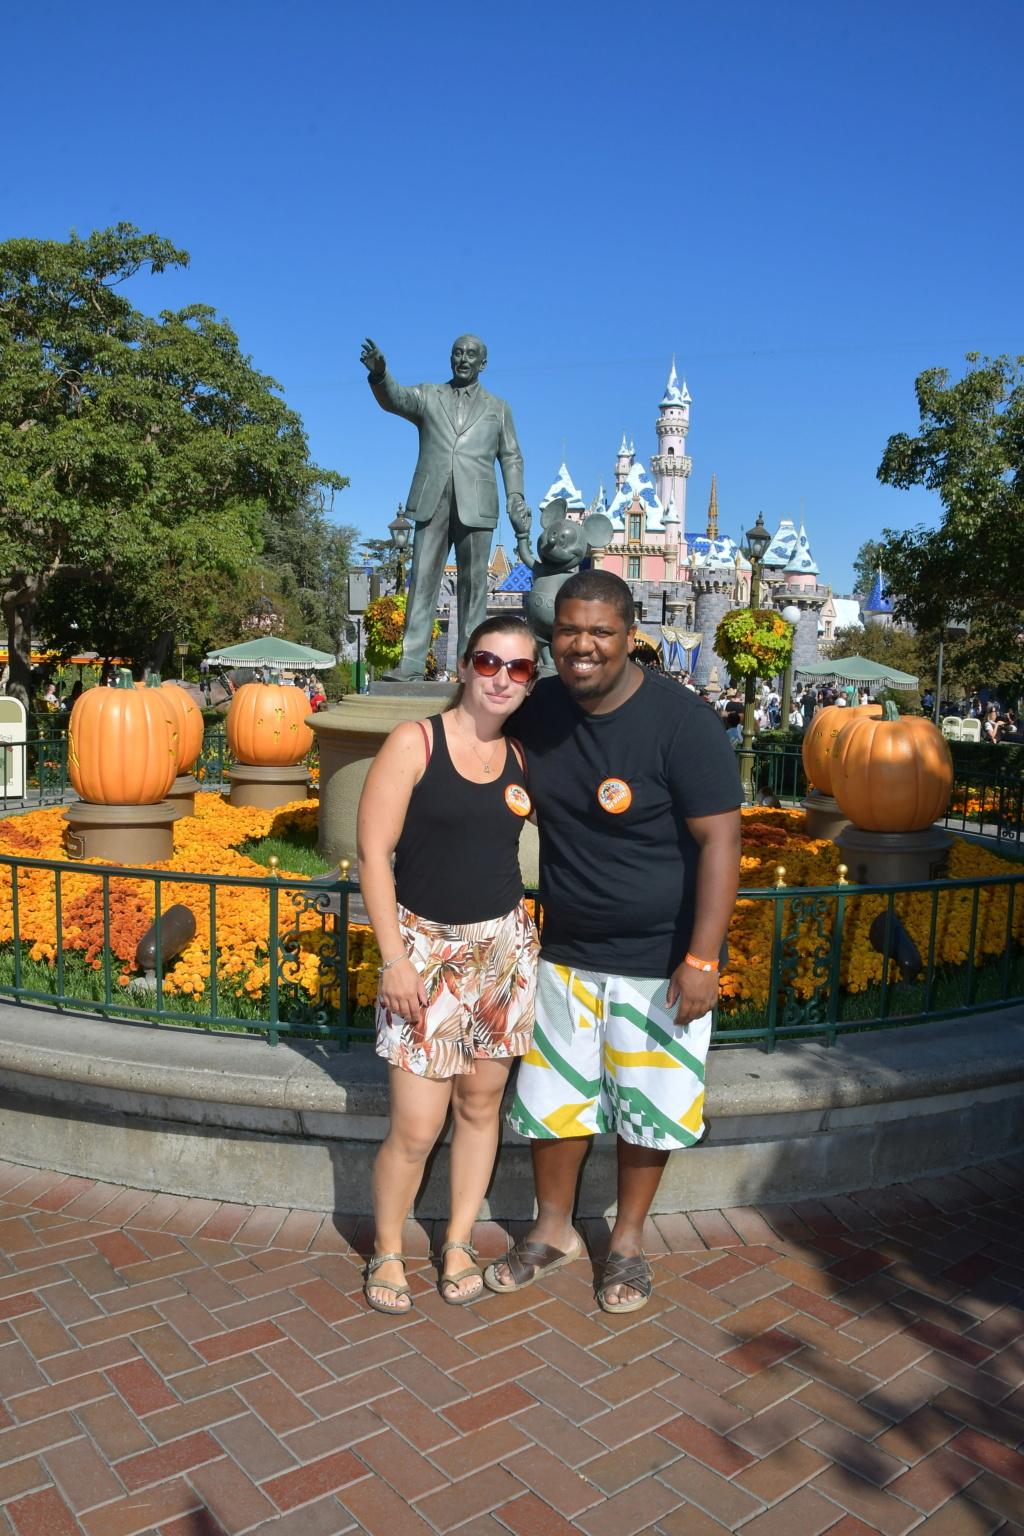 California Dream - Octobre 2019 - Disneyland Ressort à partir de la page 3  - Page 4 Img_1218